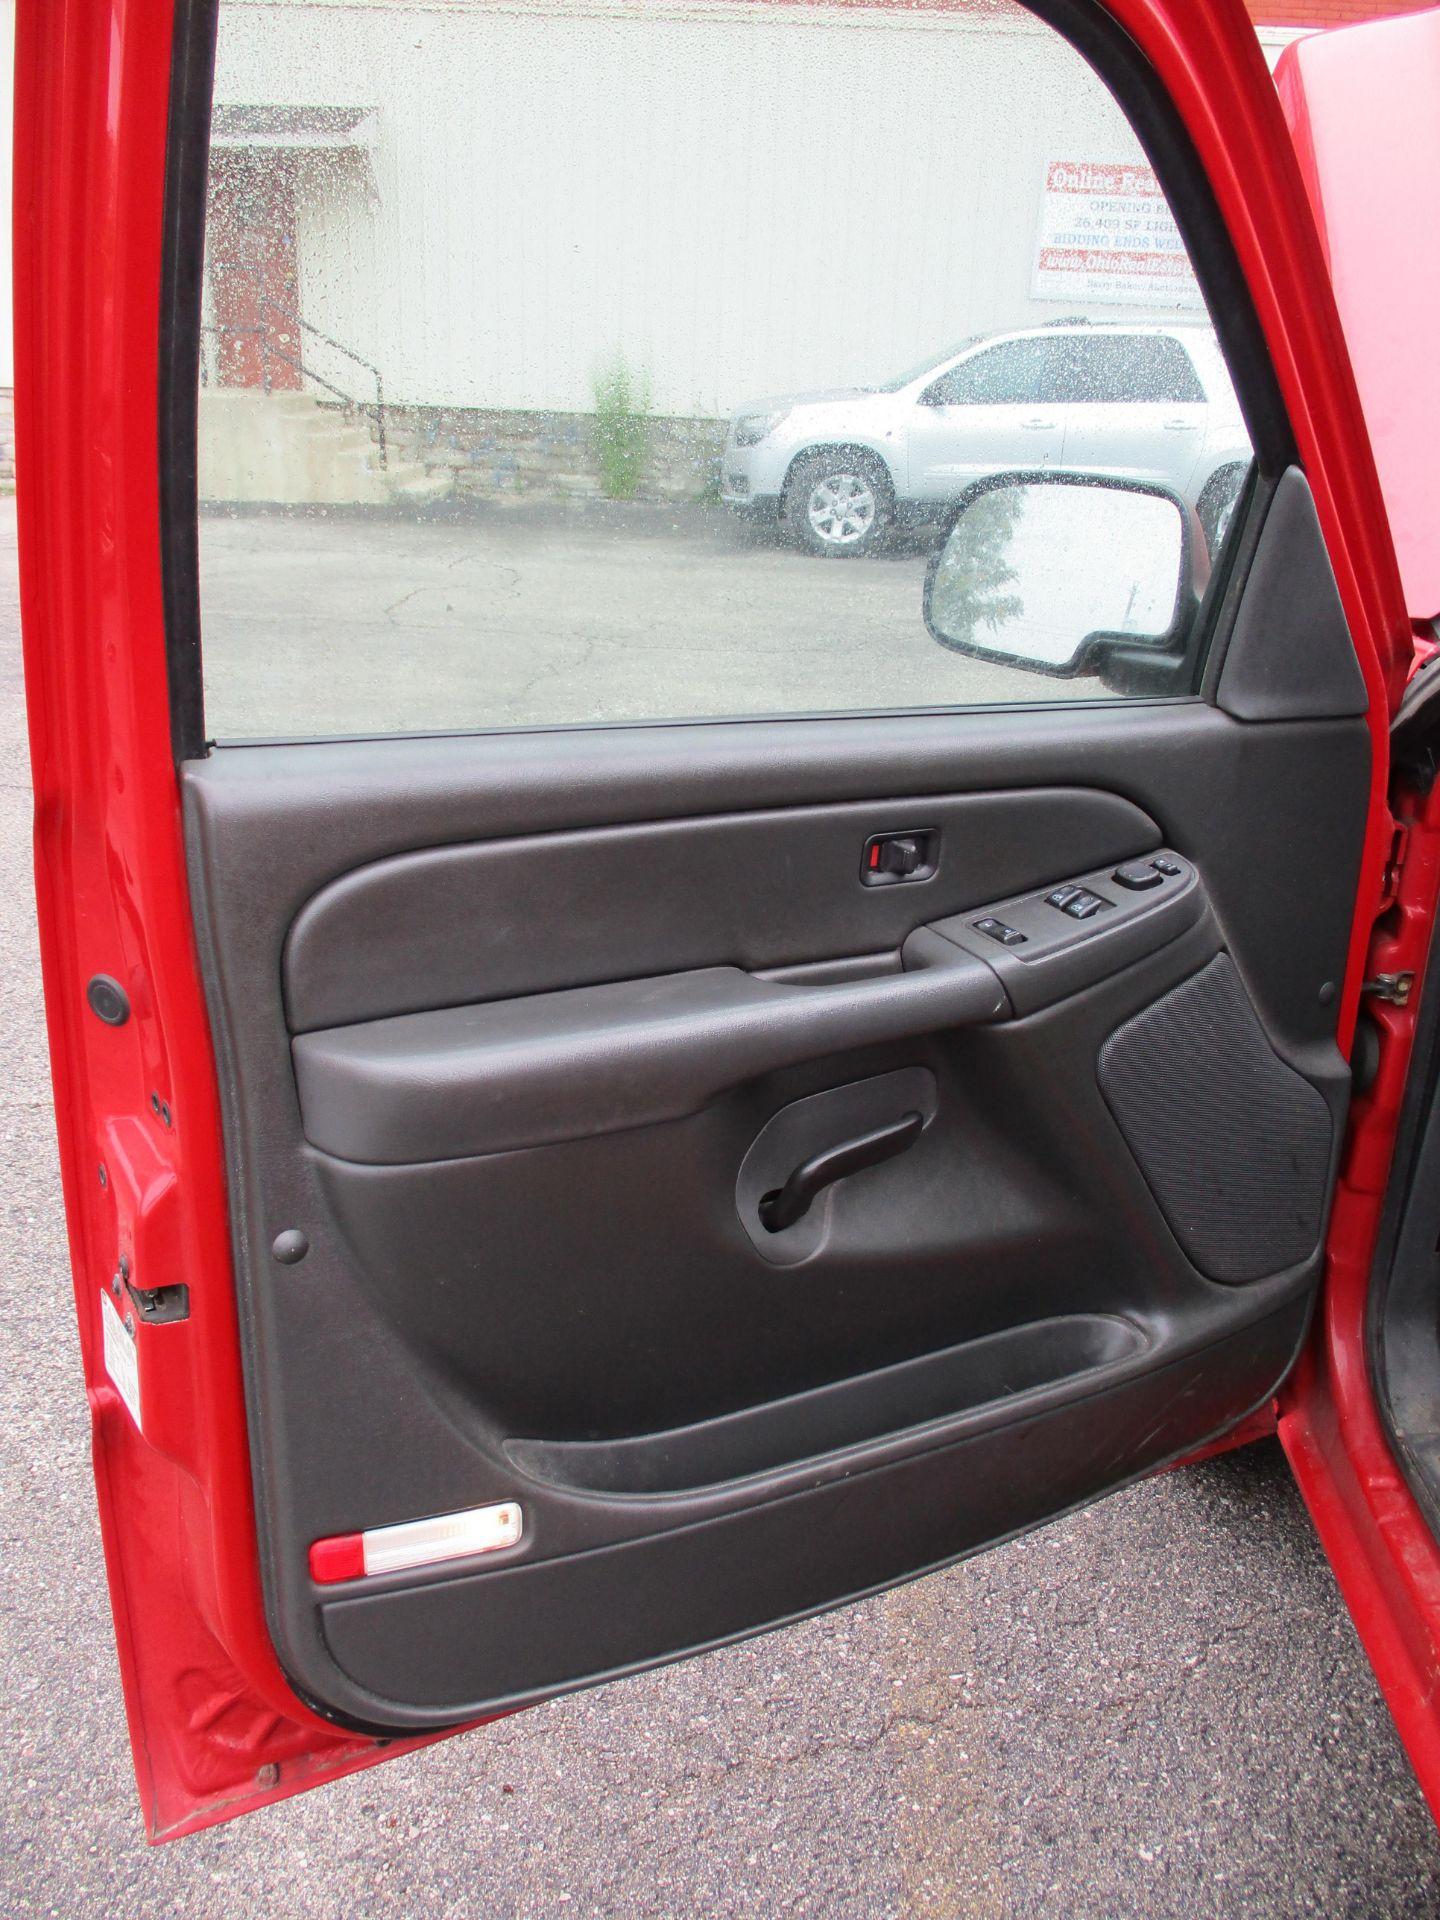 2006 Chevrolet Silverado 1500 LT Pickup, VIN 1GCEC14V96E251510, Regular Cab, Automatic, AC, 8' - Image 10 of 21